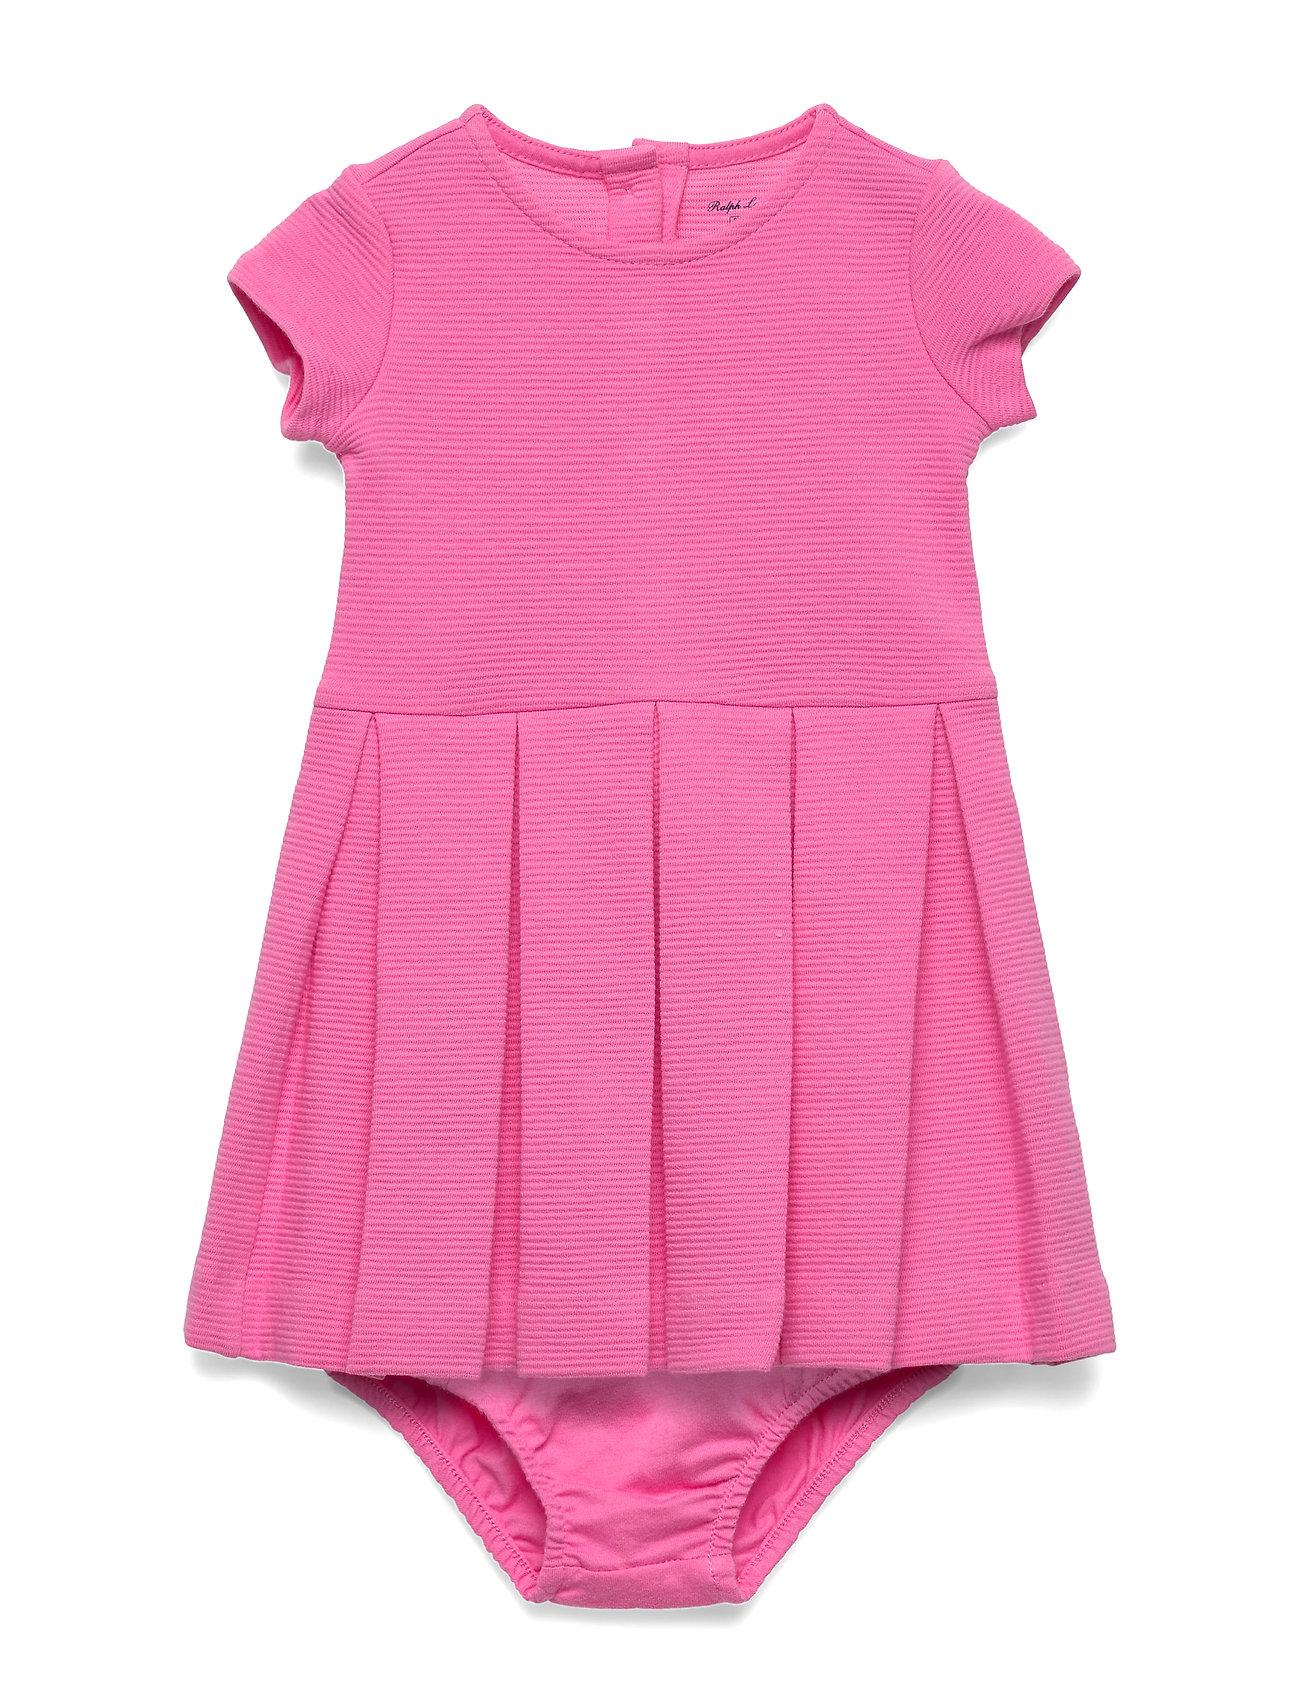 Ralph Lauren Baby Pleated Knit Dress & Bloomer - BAJA PINK